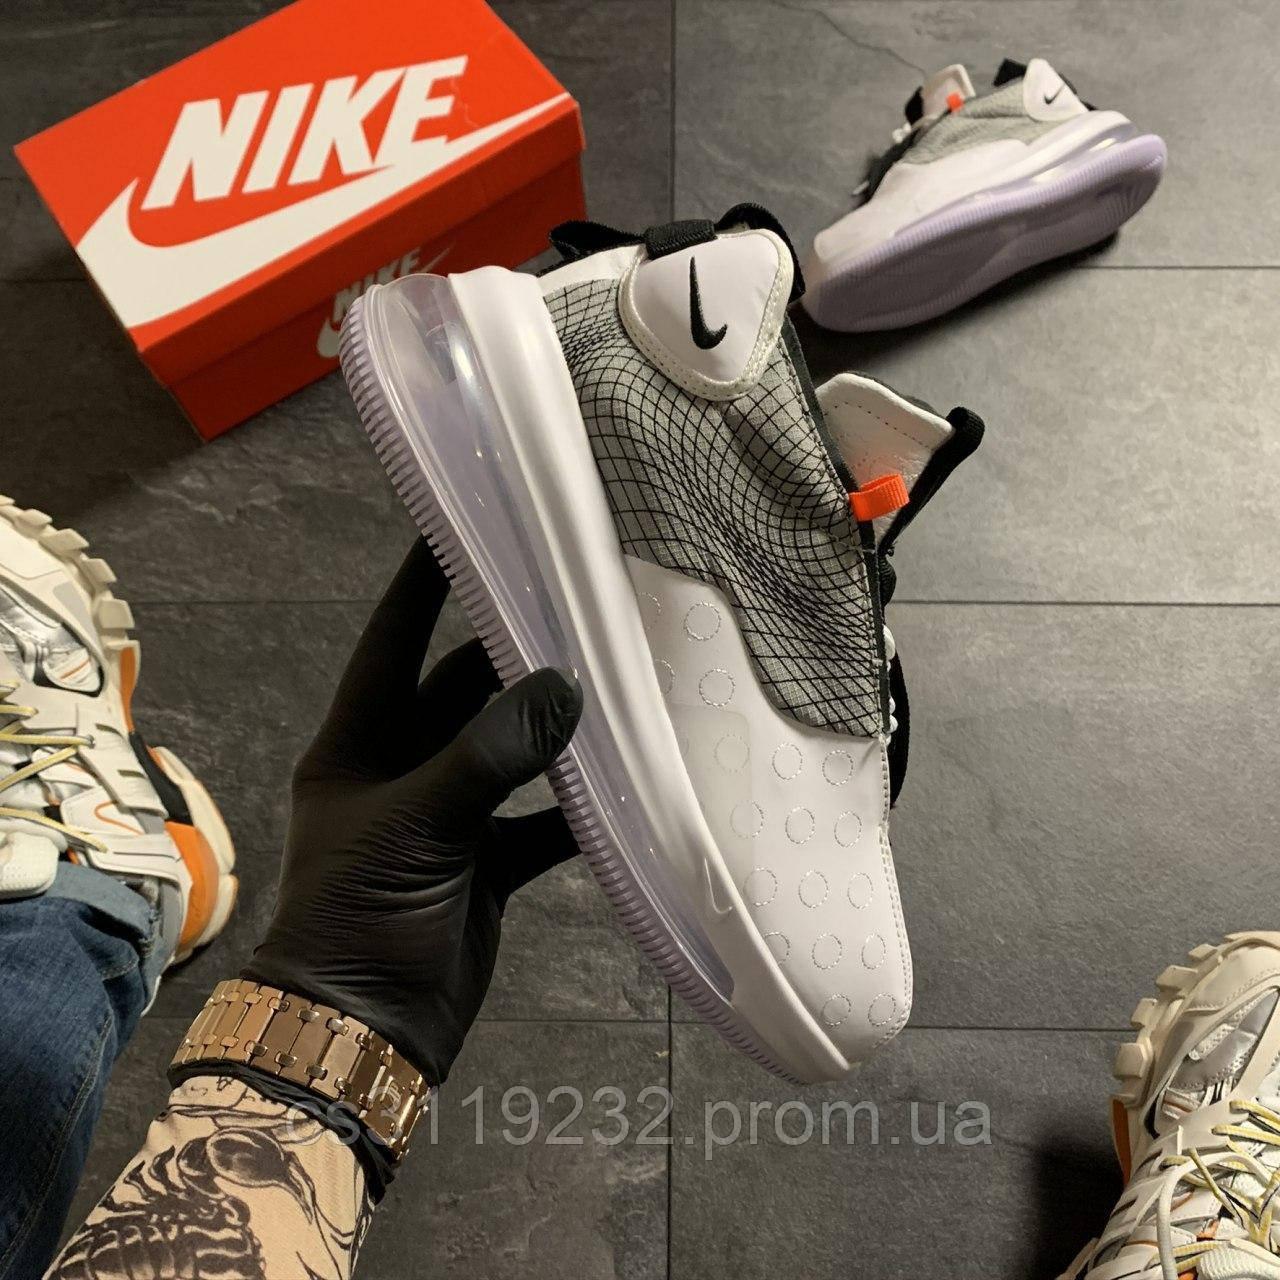 Мужские кроссовки Nike Air Max 720 Sneakerboots Gray (белые)